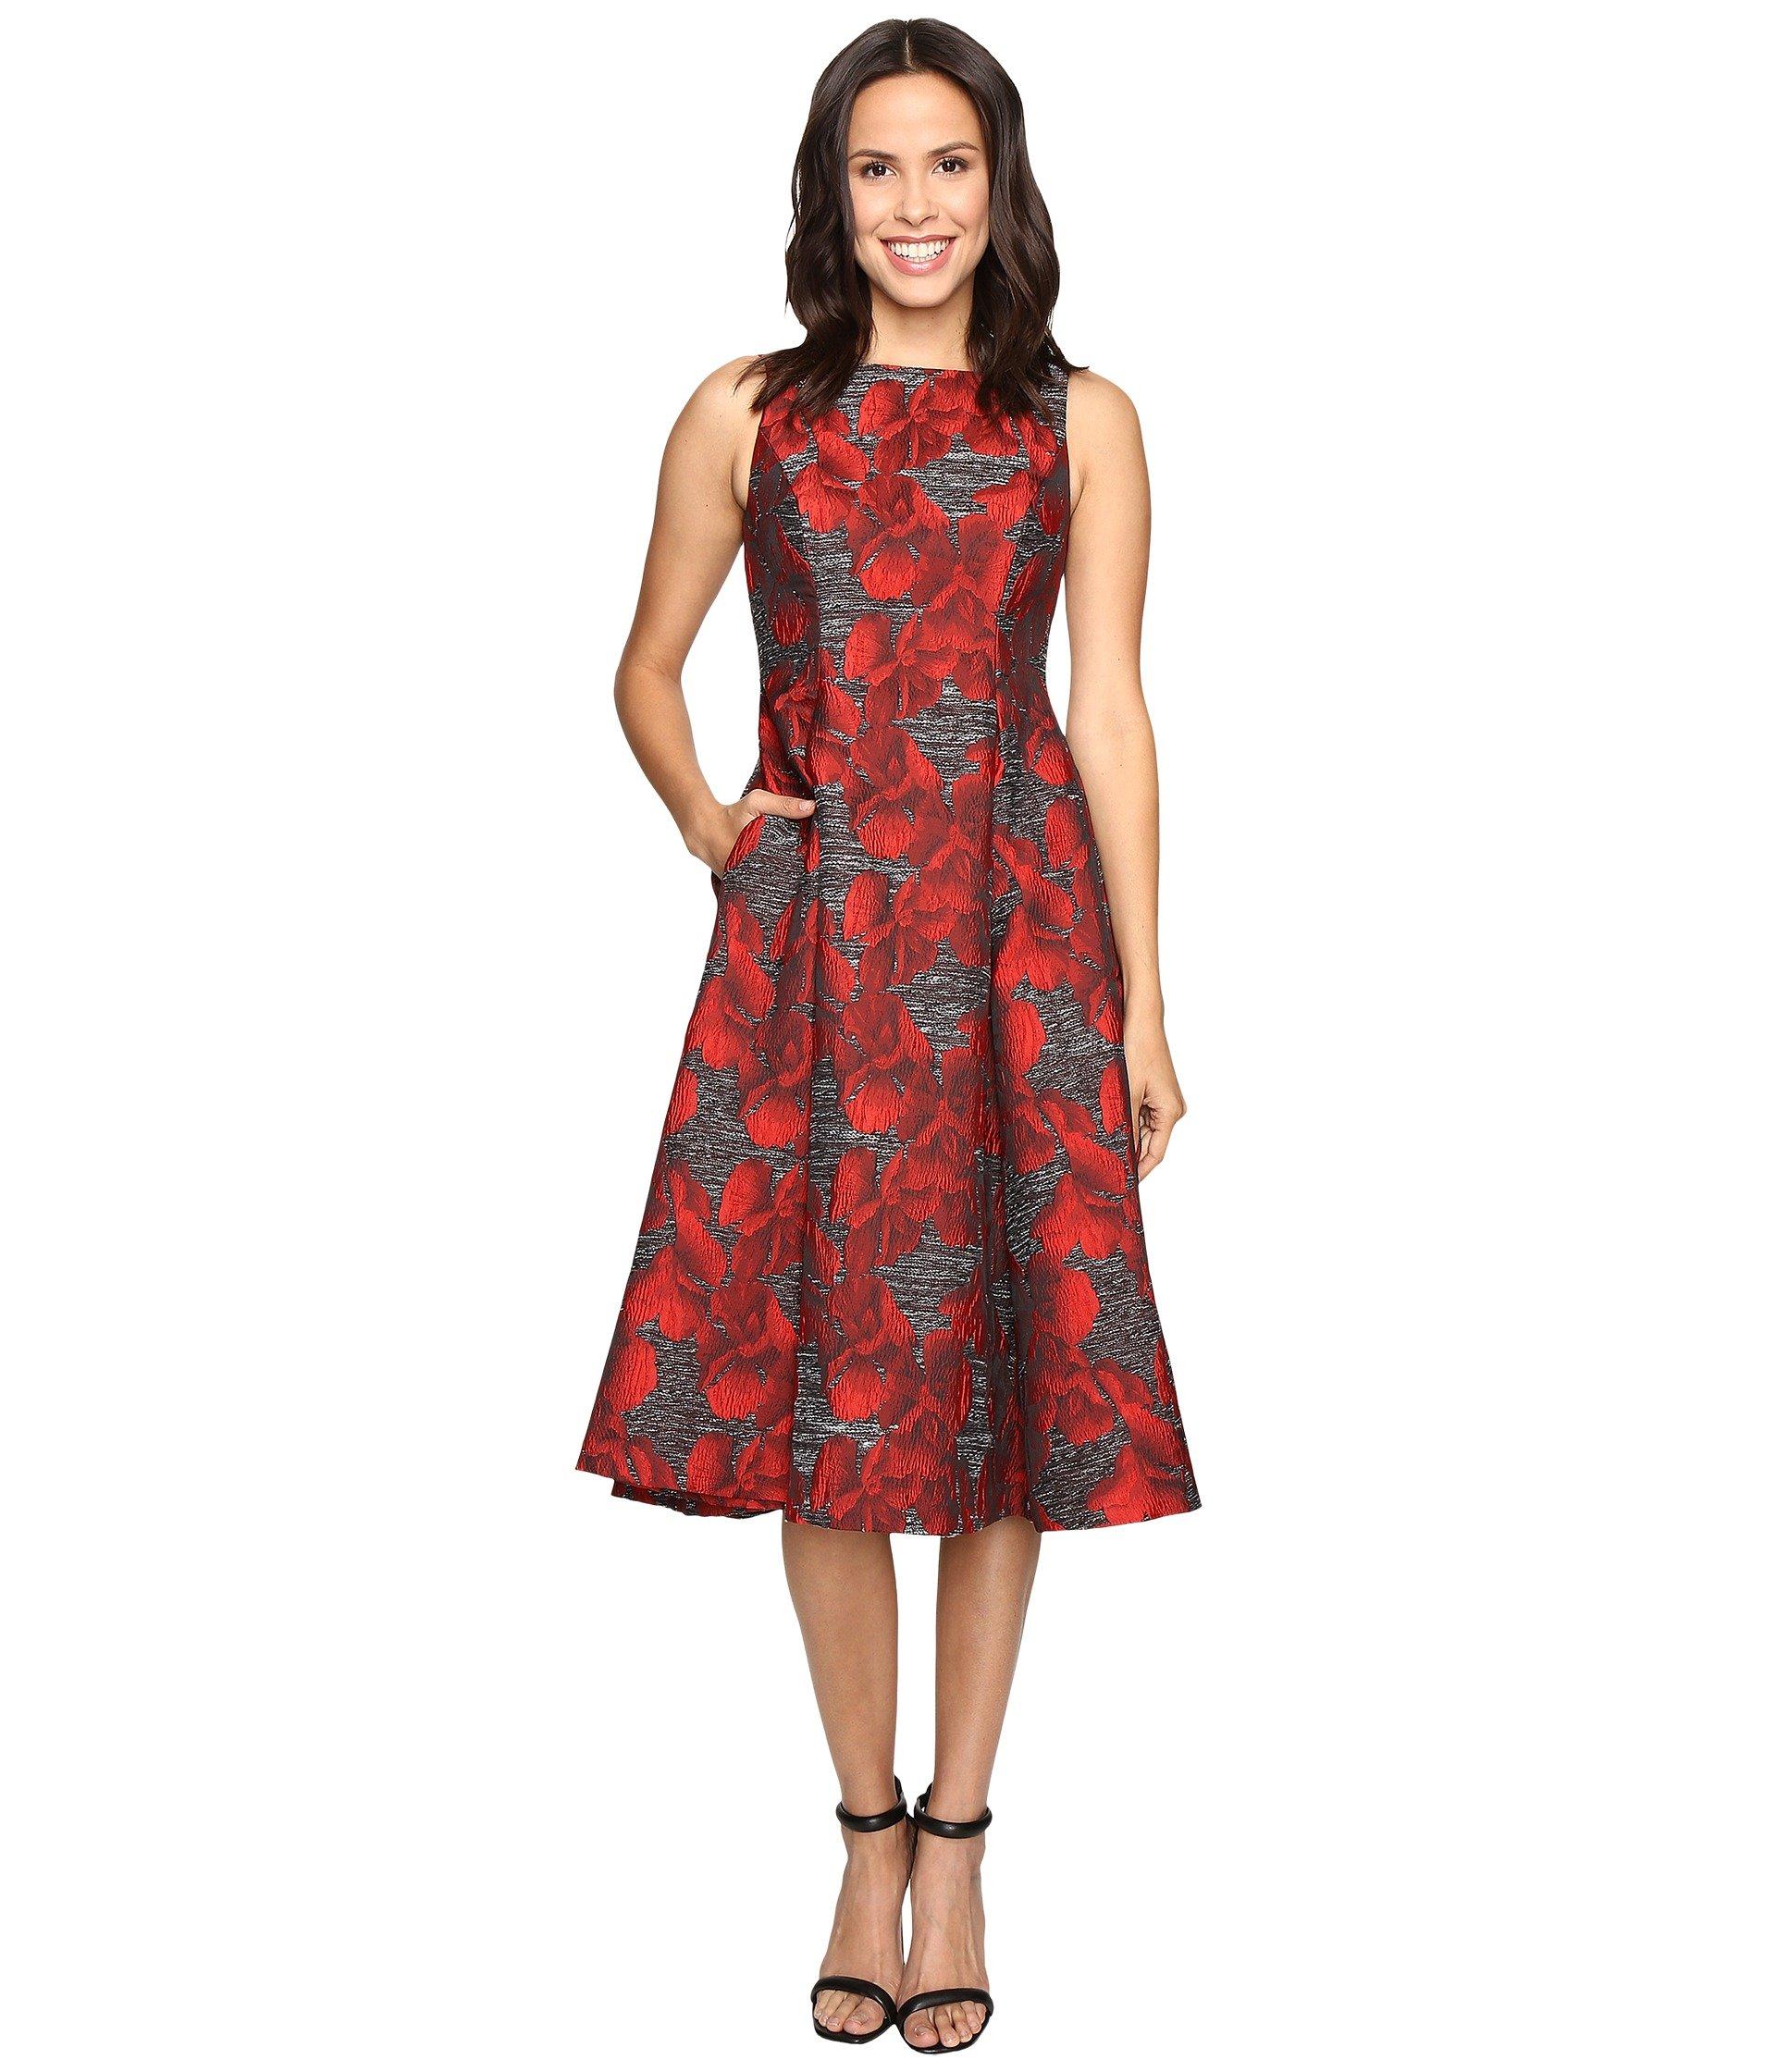 Adrianna Papell Women's Sleeveless Jacquard Tea Length Dress Black/Crimson Dress